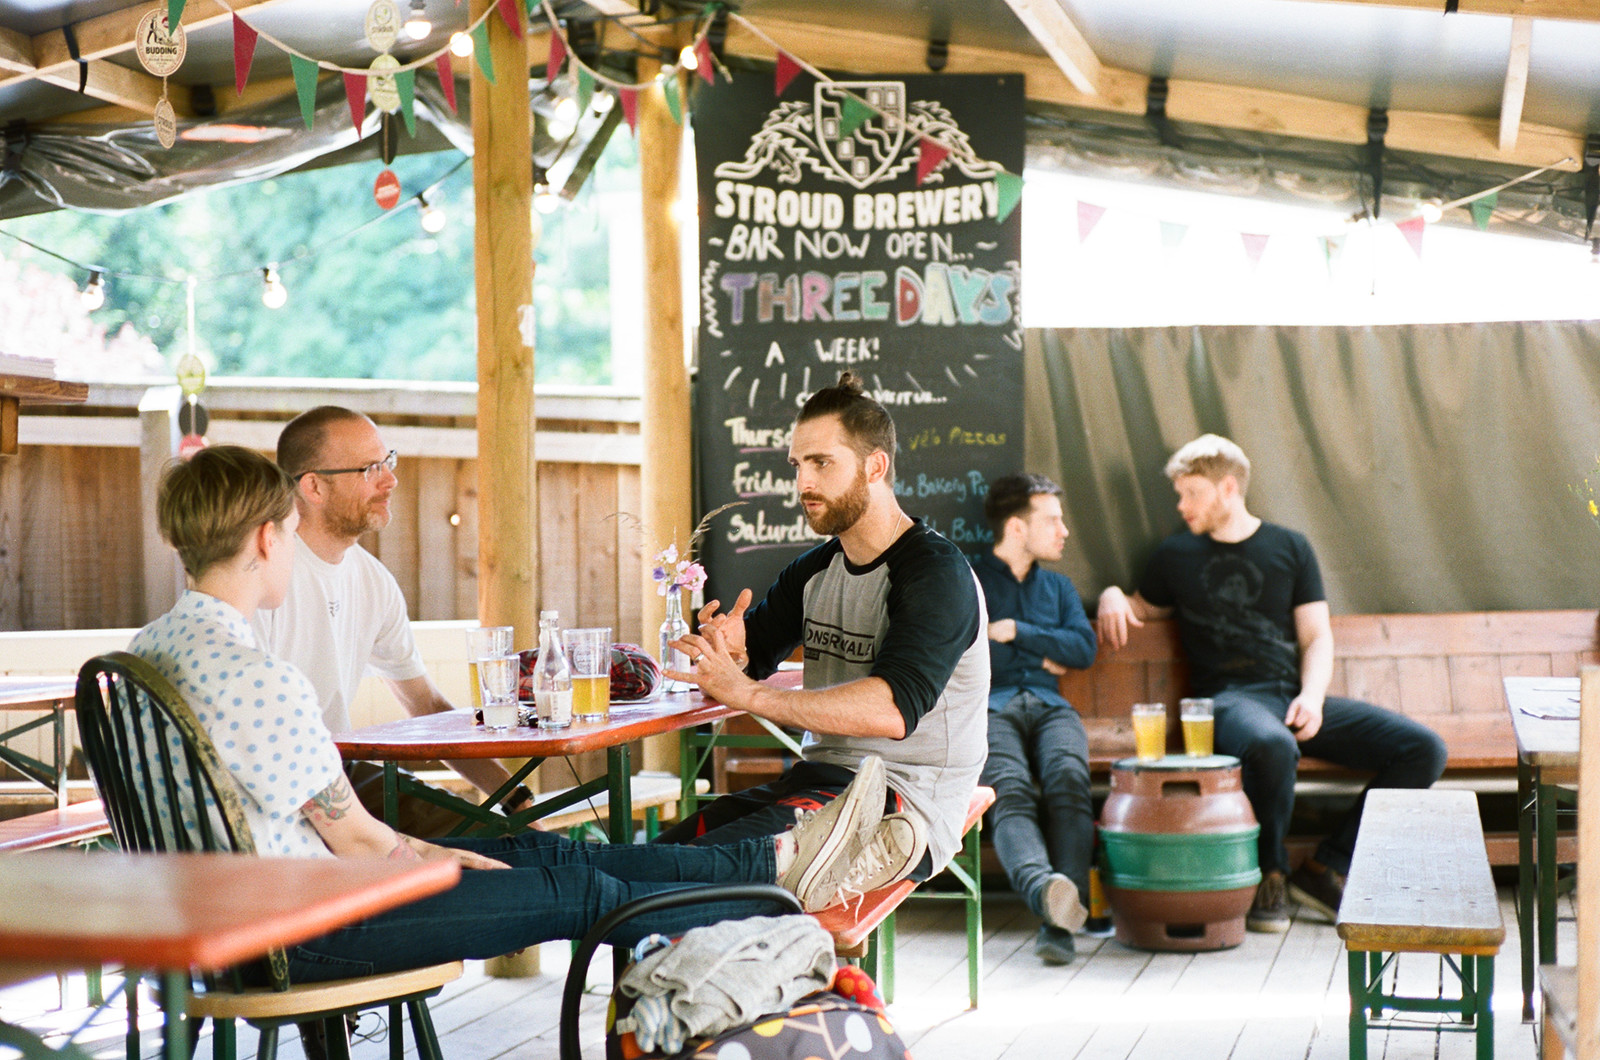 Stroud-brewery-30